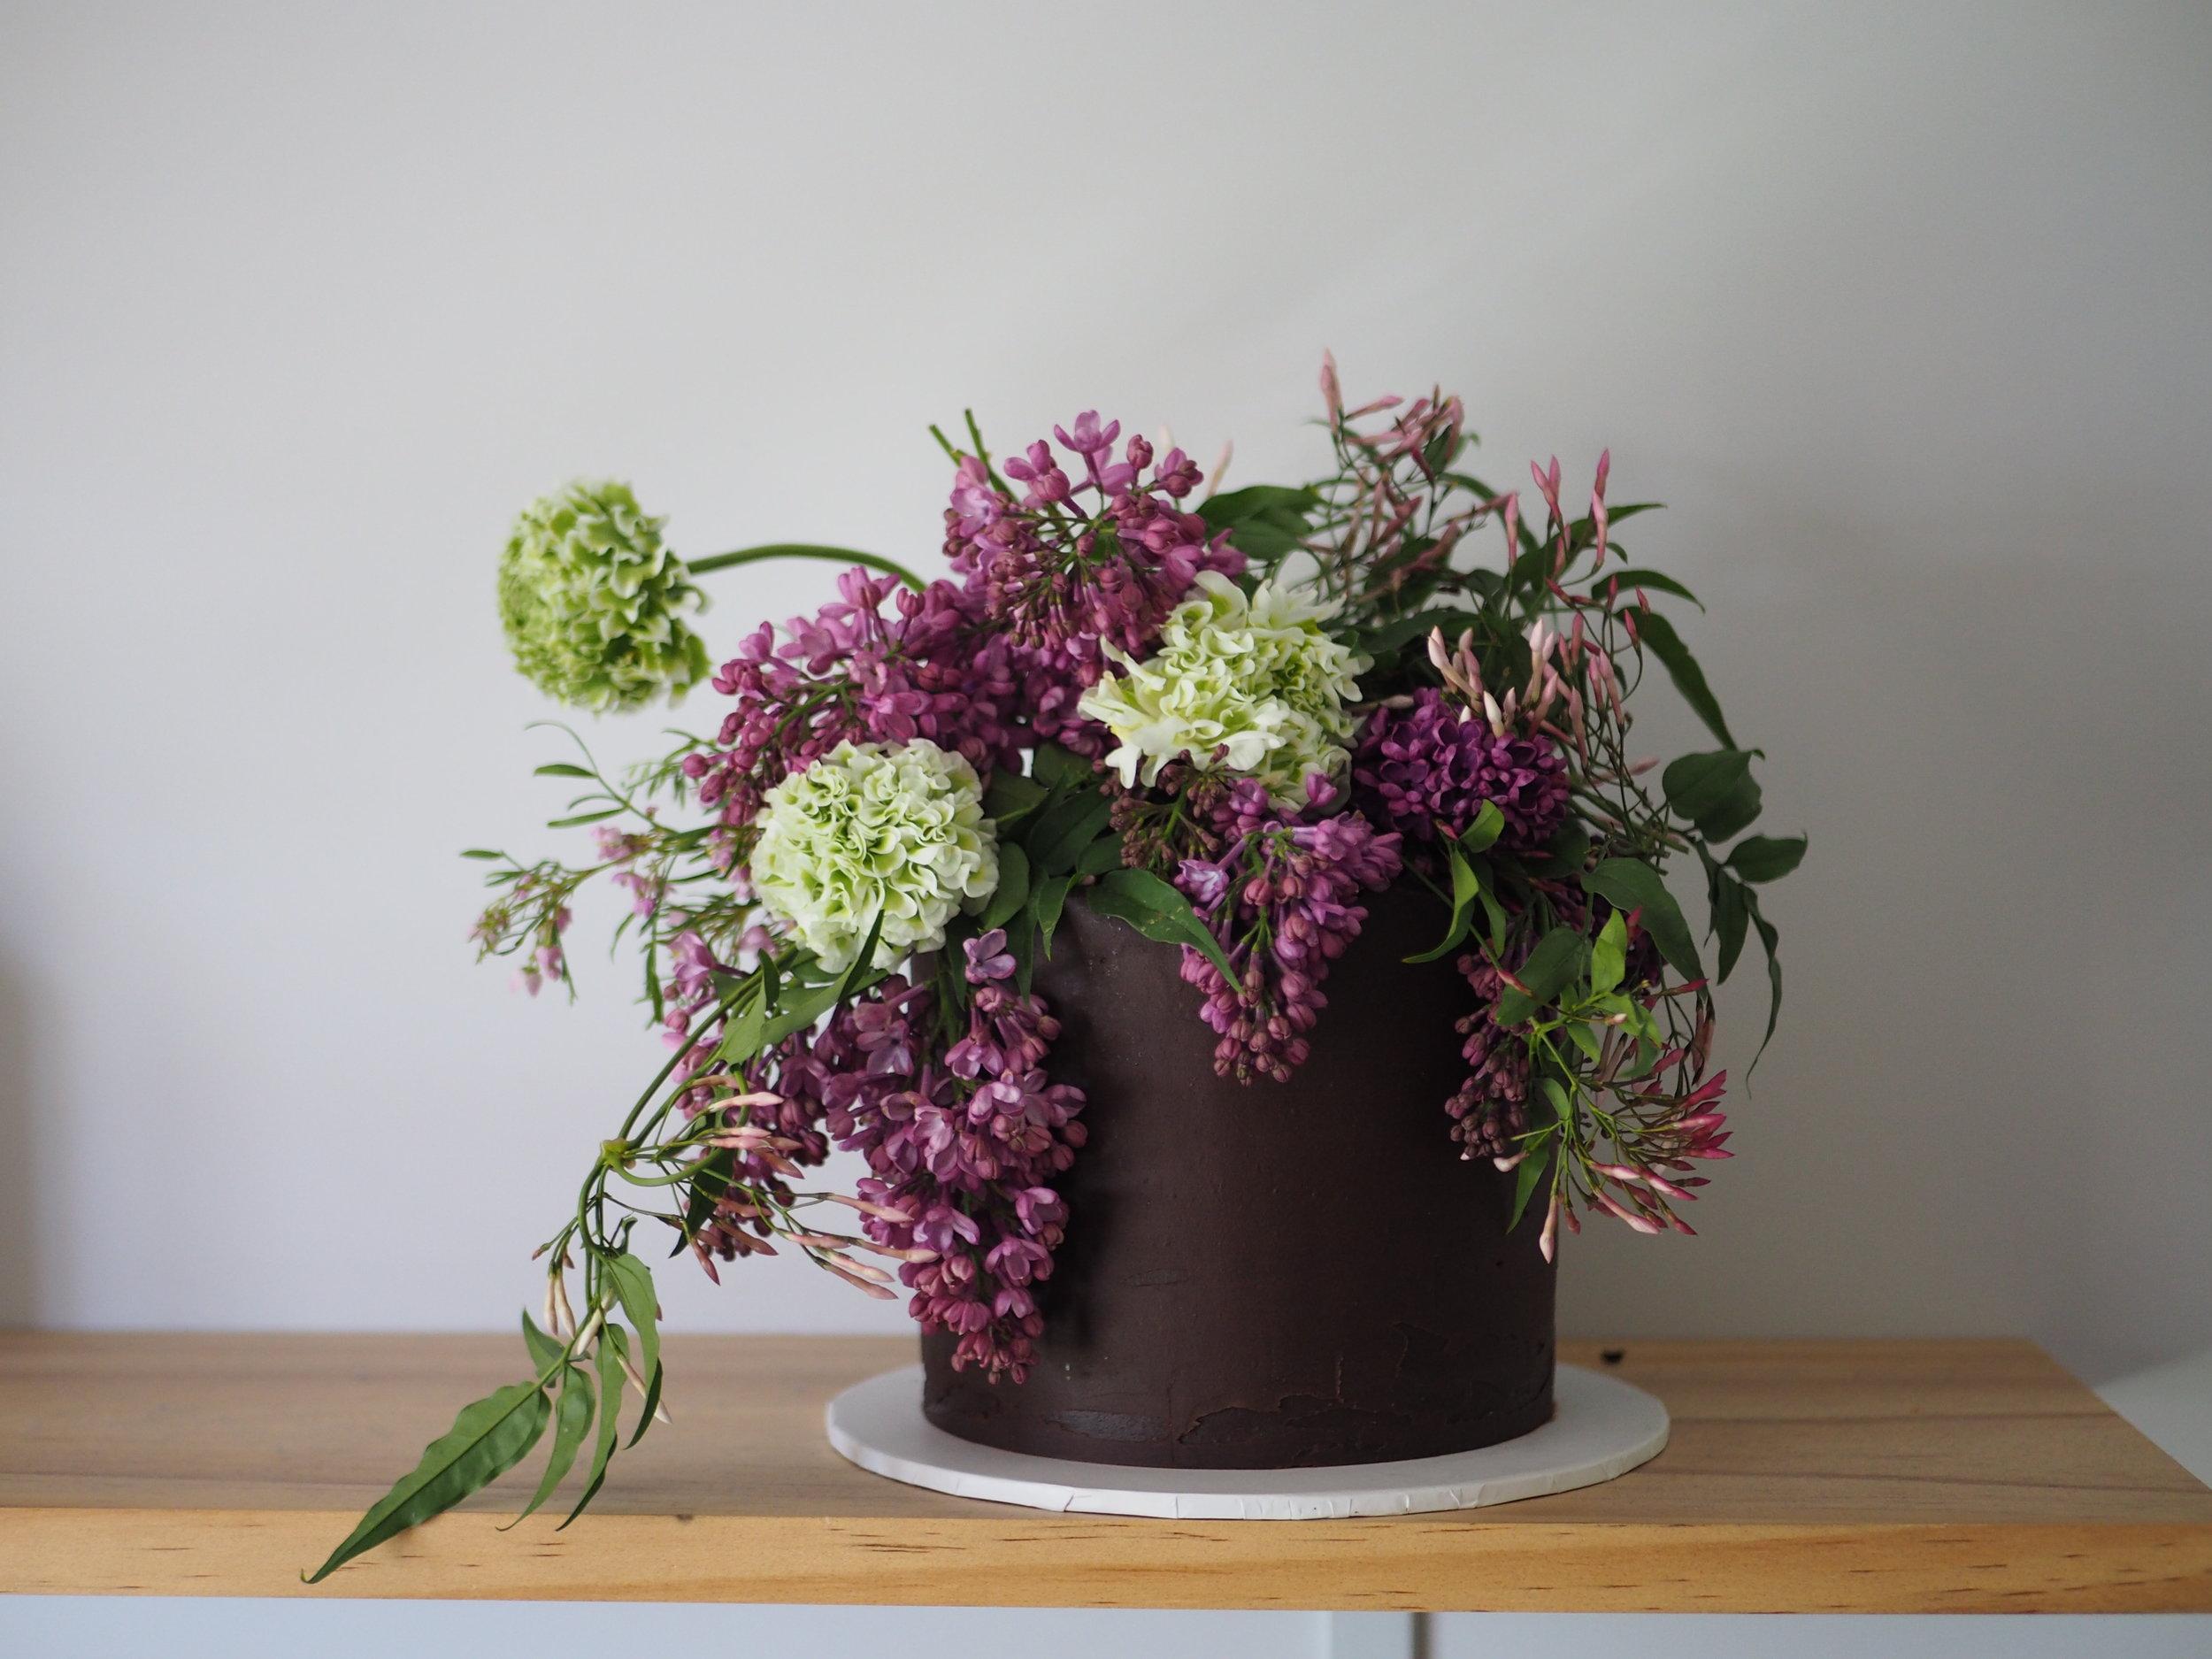 2017-10-13 Lilac cake 016.JPG